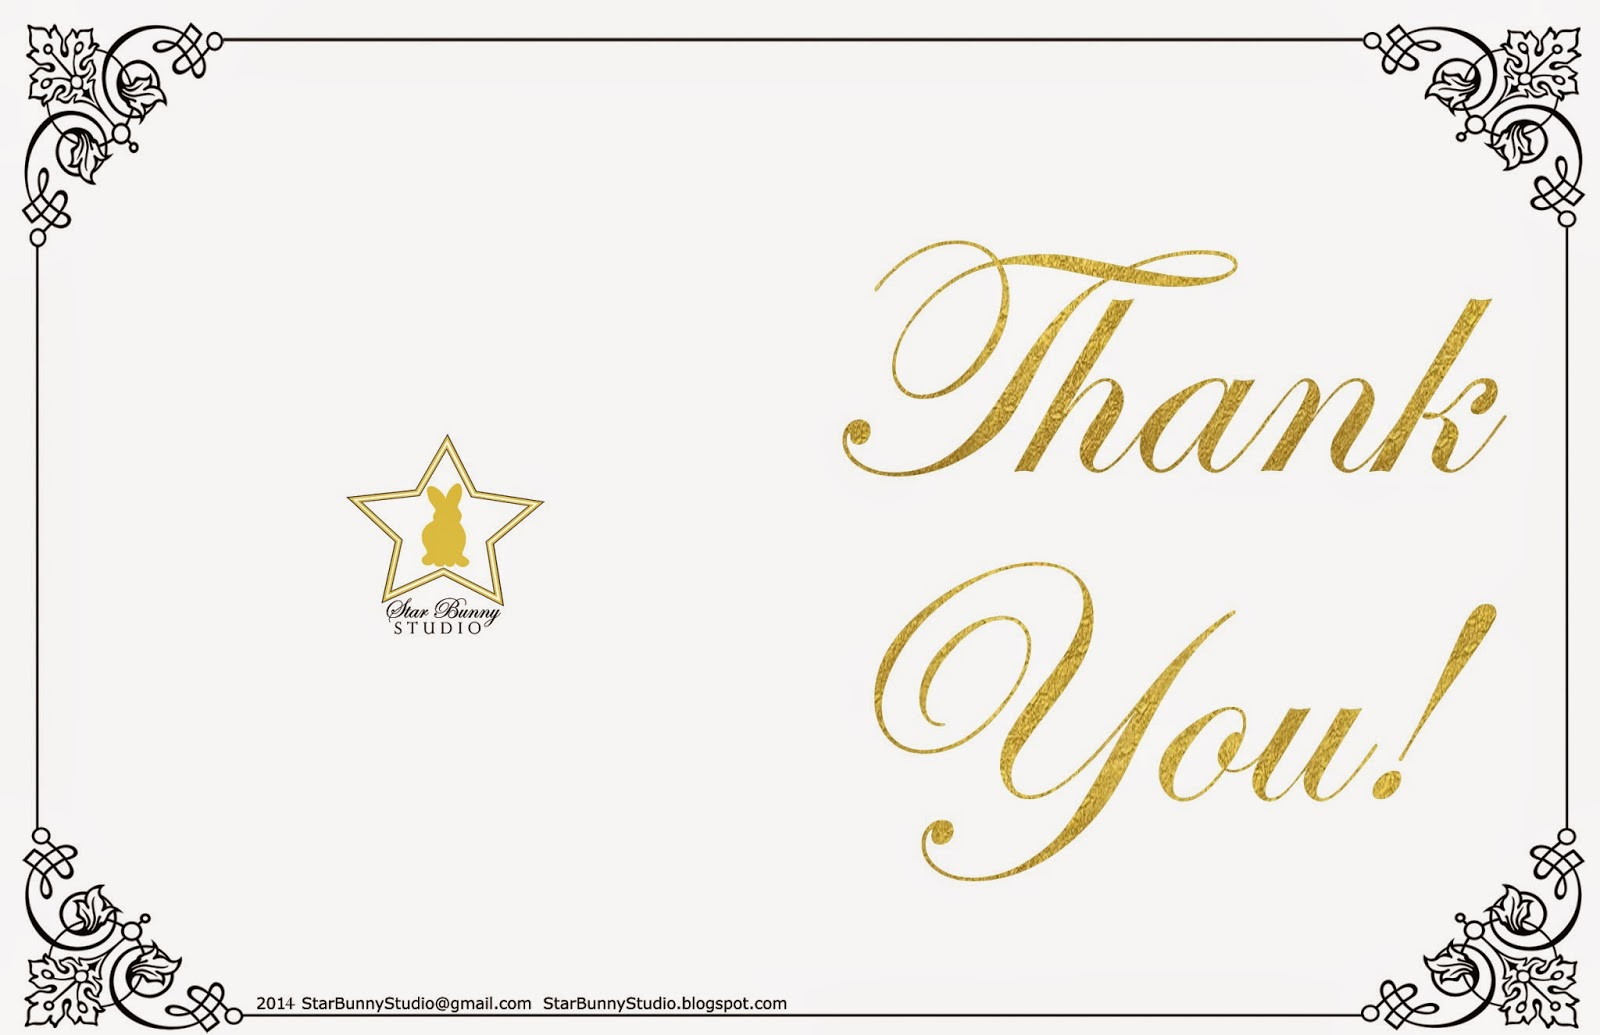 Star Bunny Studio 2014 Thank YOU!